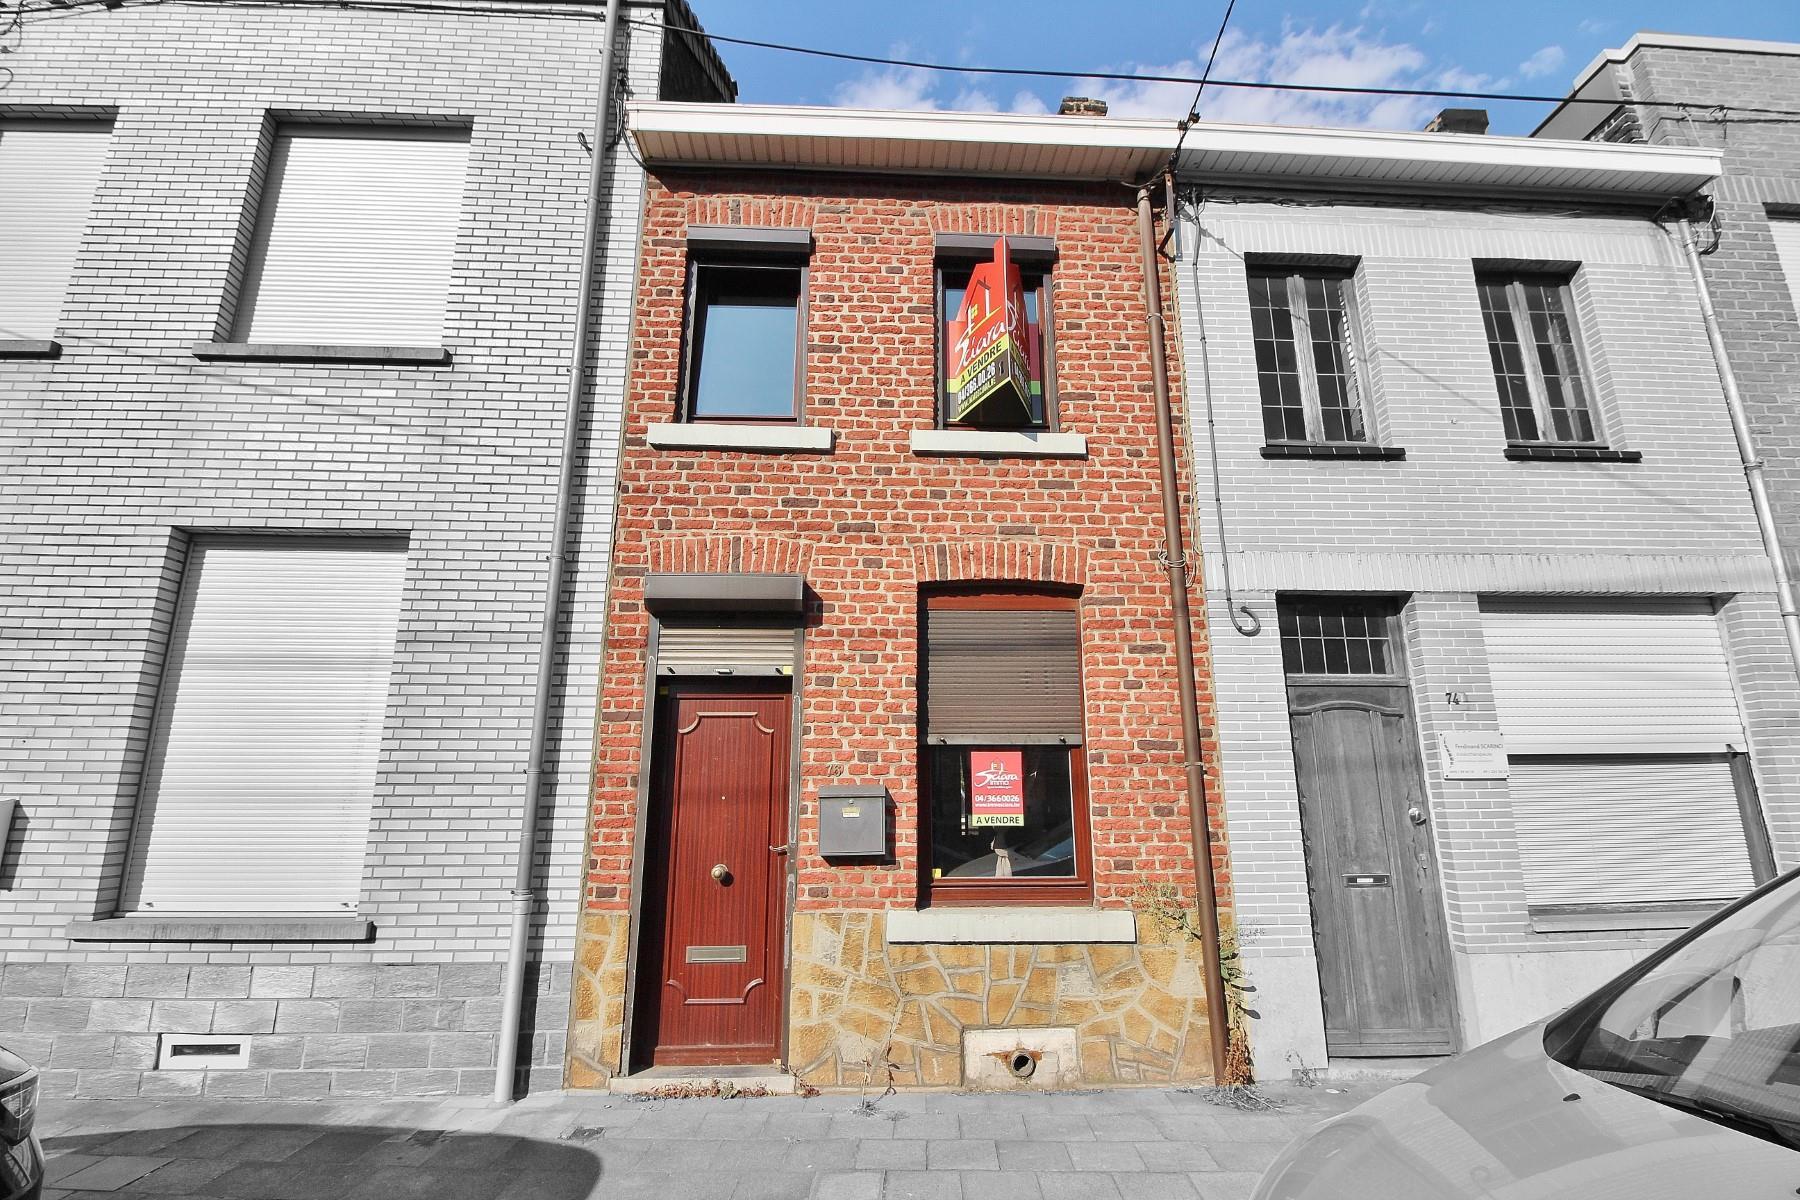 Maison - Seraing Jemeppesur-Meuse - #3539725-0